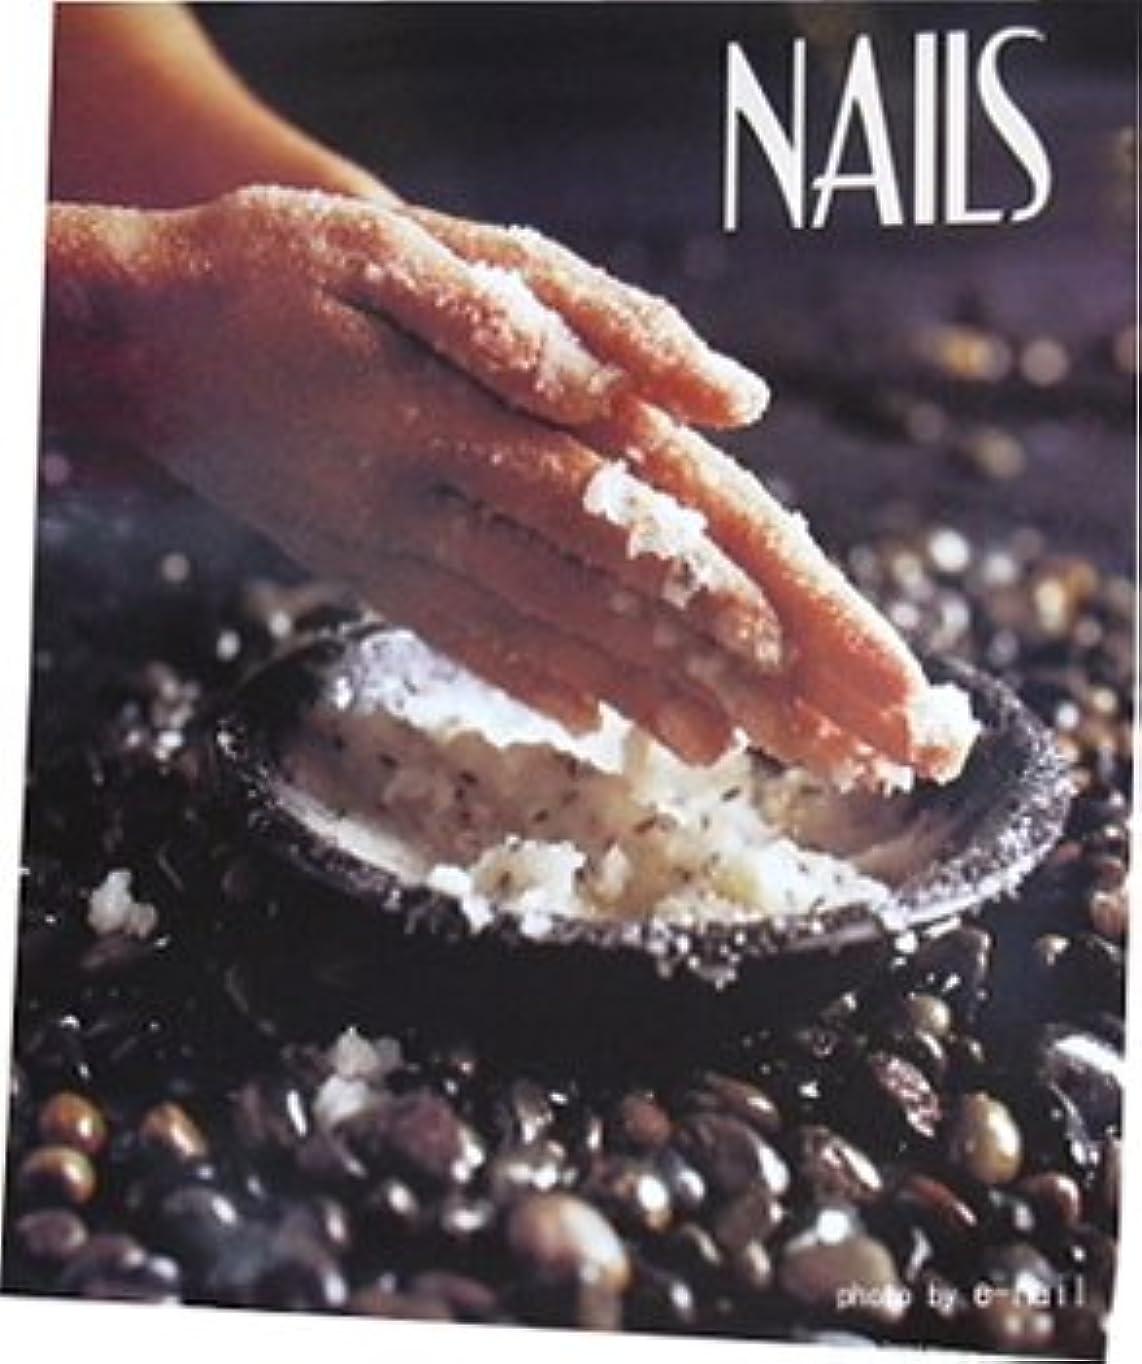 NAILS ポスター 【Salt scrub, Anyone?】